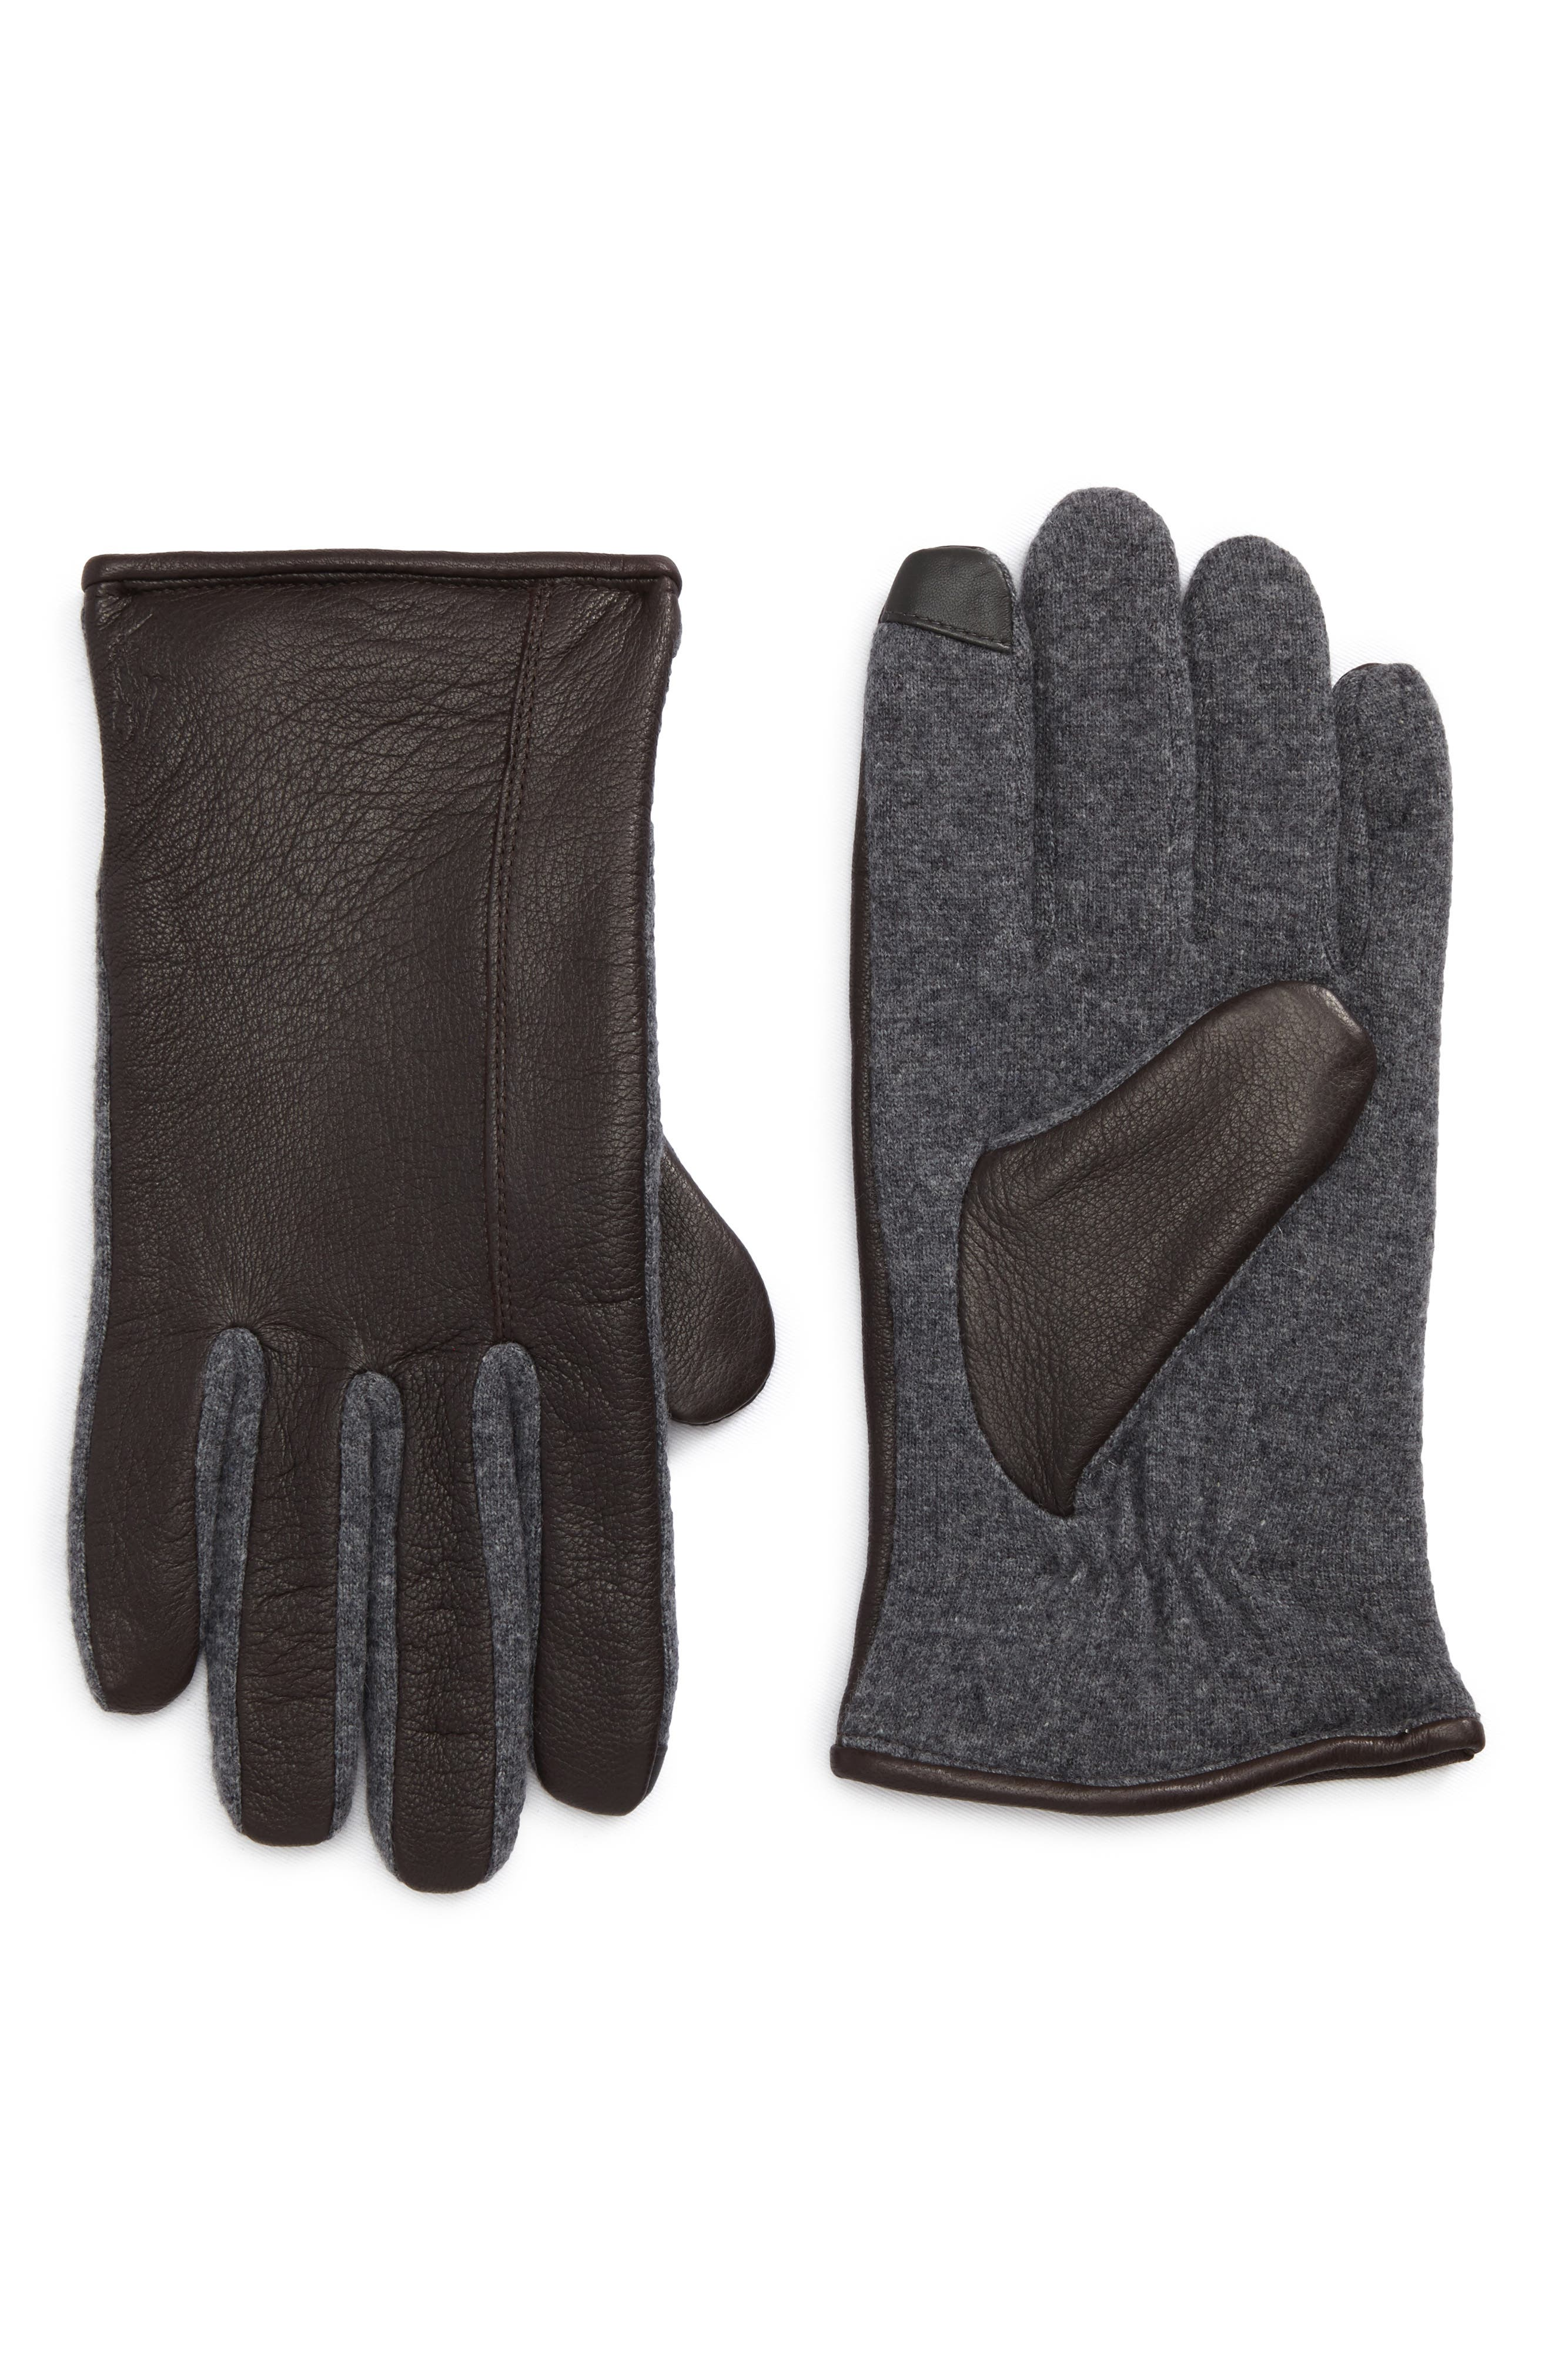 Ralph Lauren Deer Leather Hybrid Driving Gloves